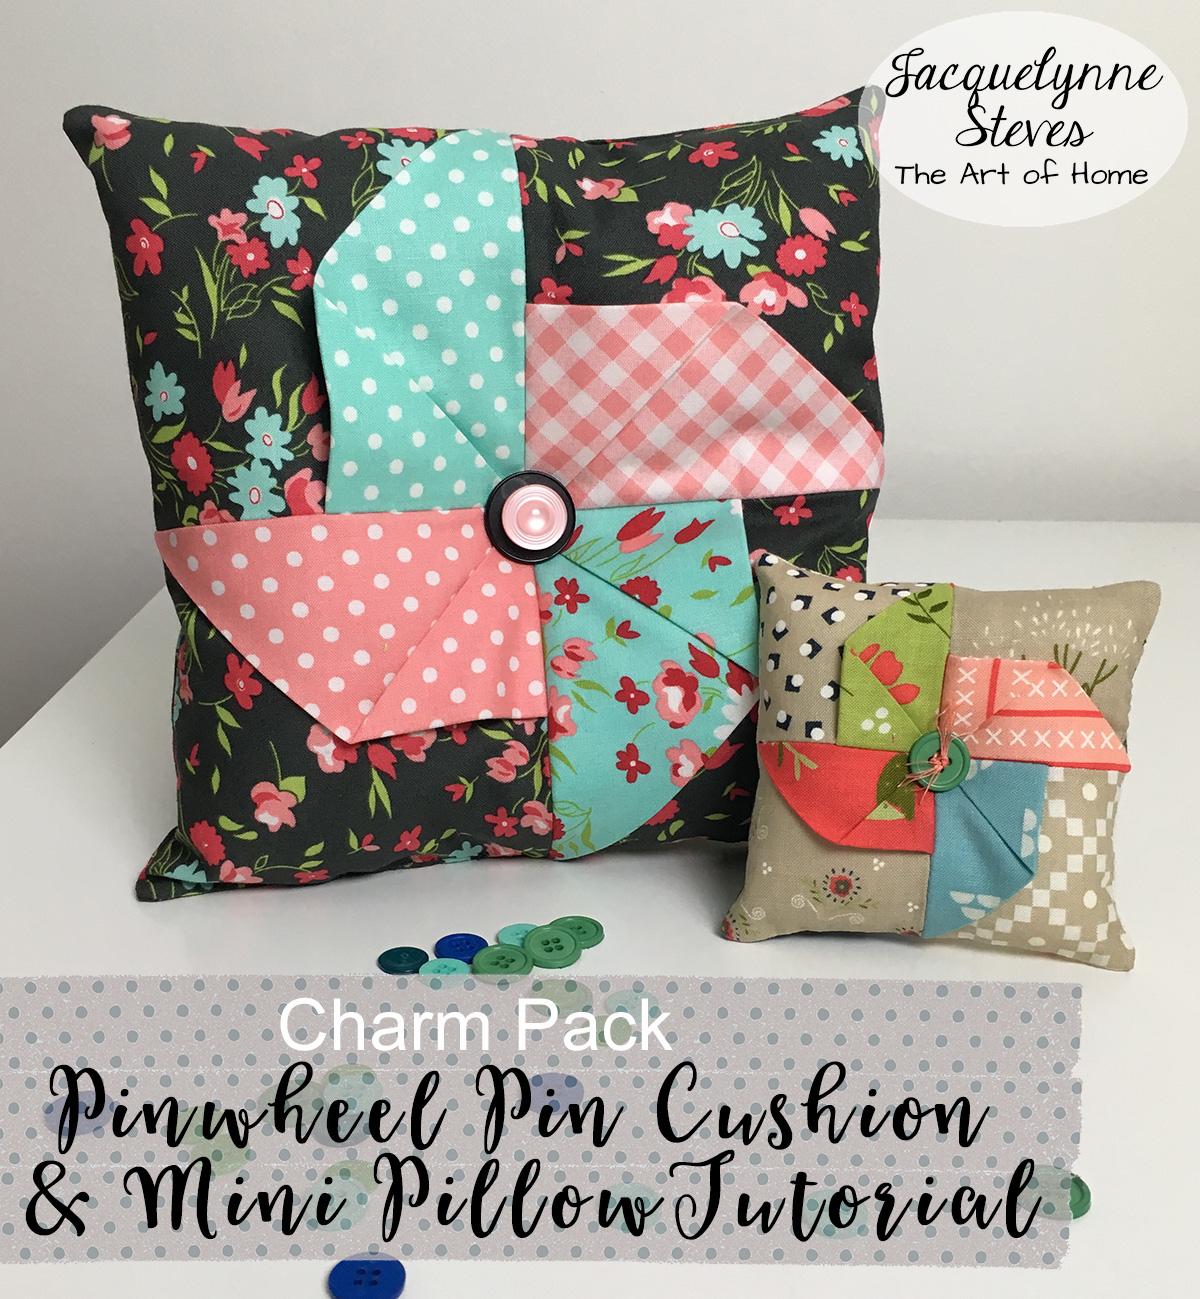 Pinwheel Pin Cushion & Mini Pillow Tutorial